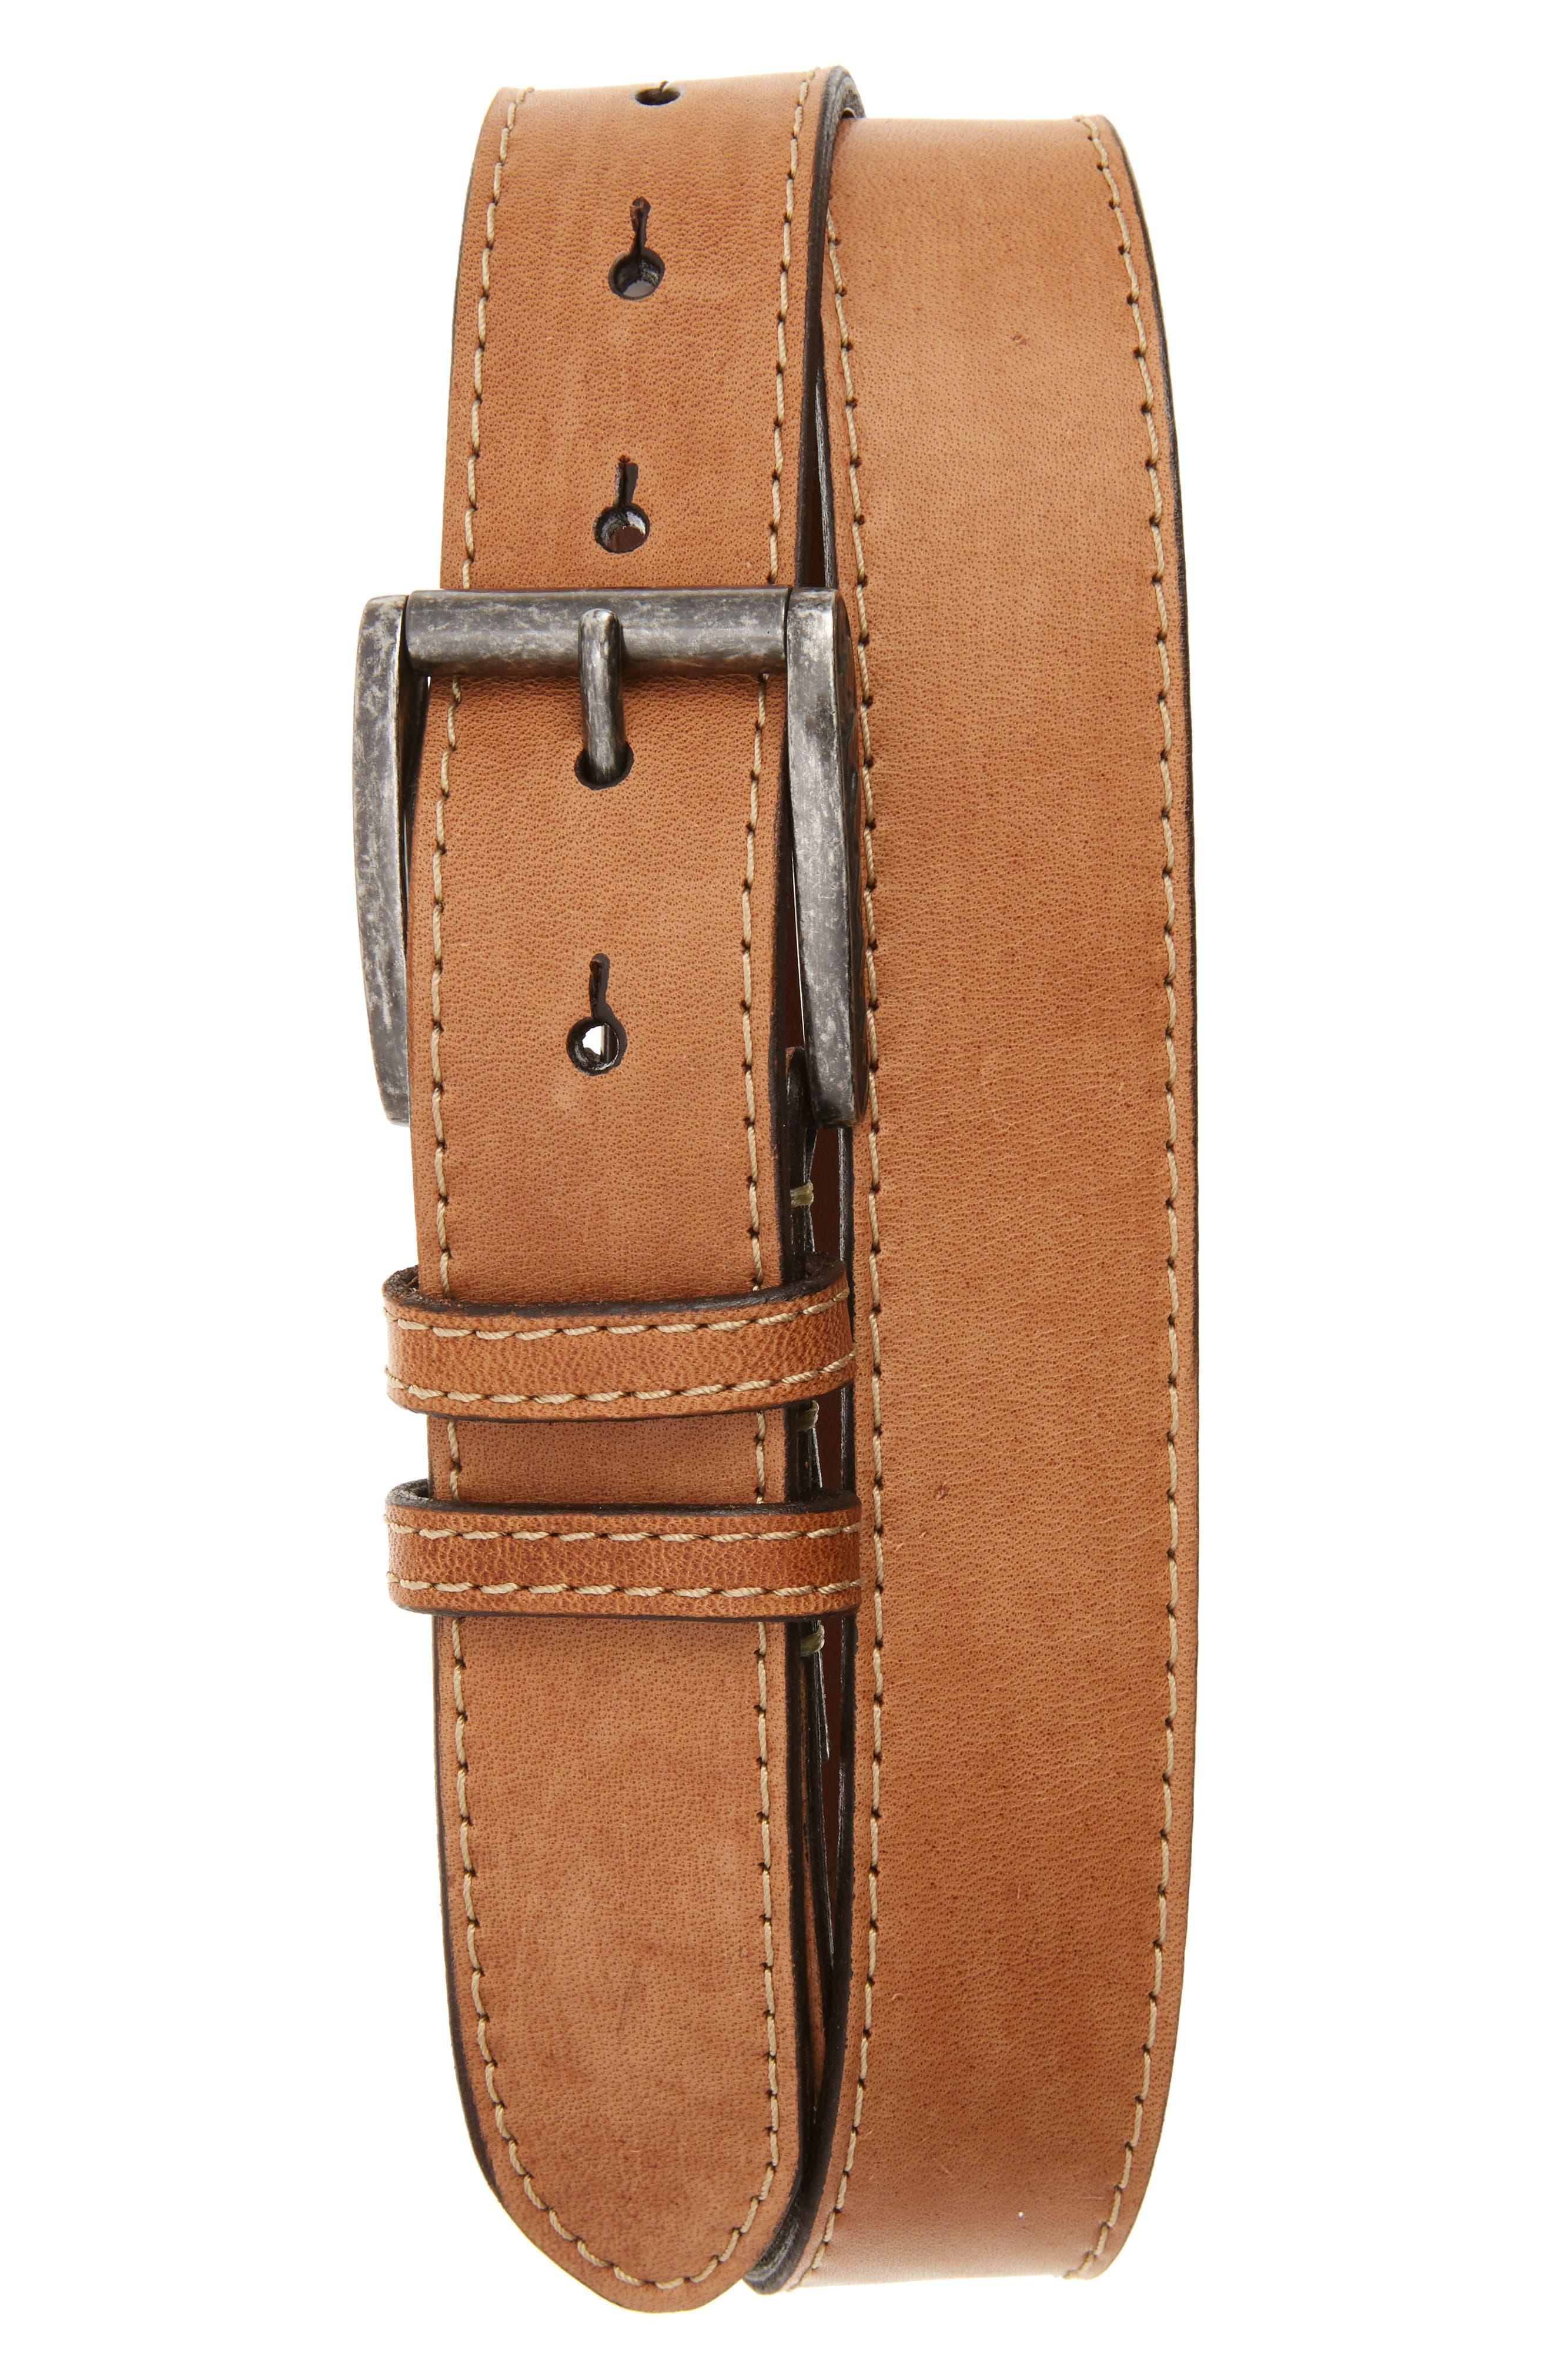 Main Image - Torino Belts Waxed Horsehide Leather Belt